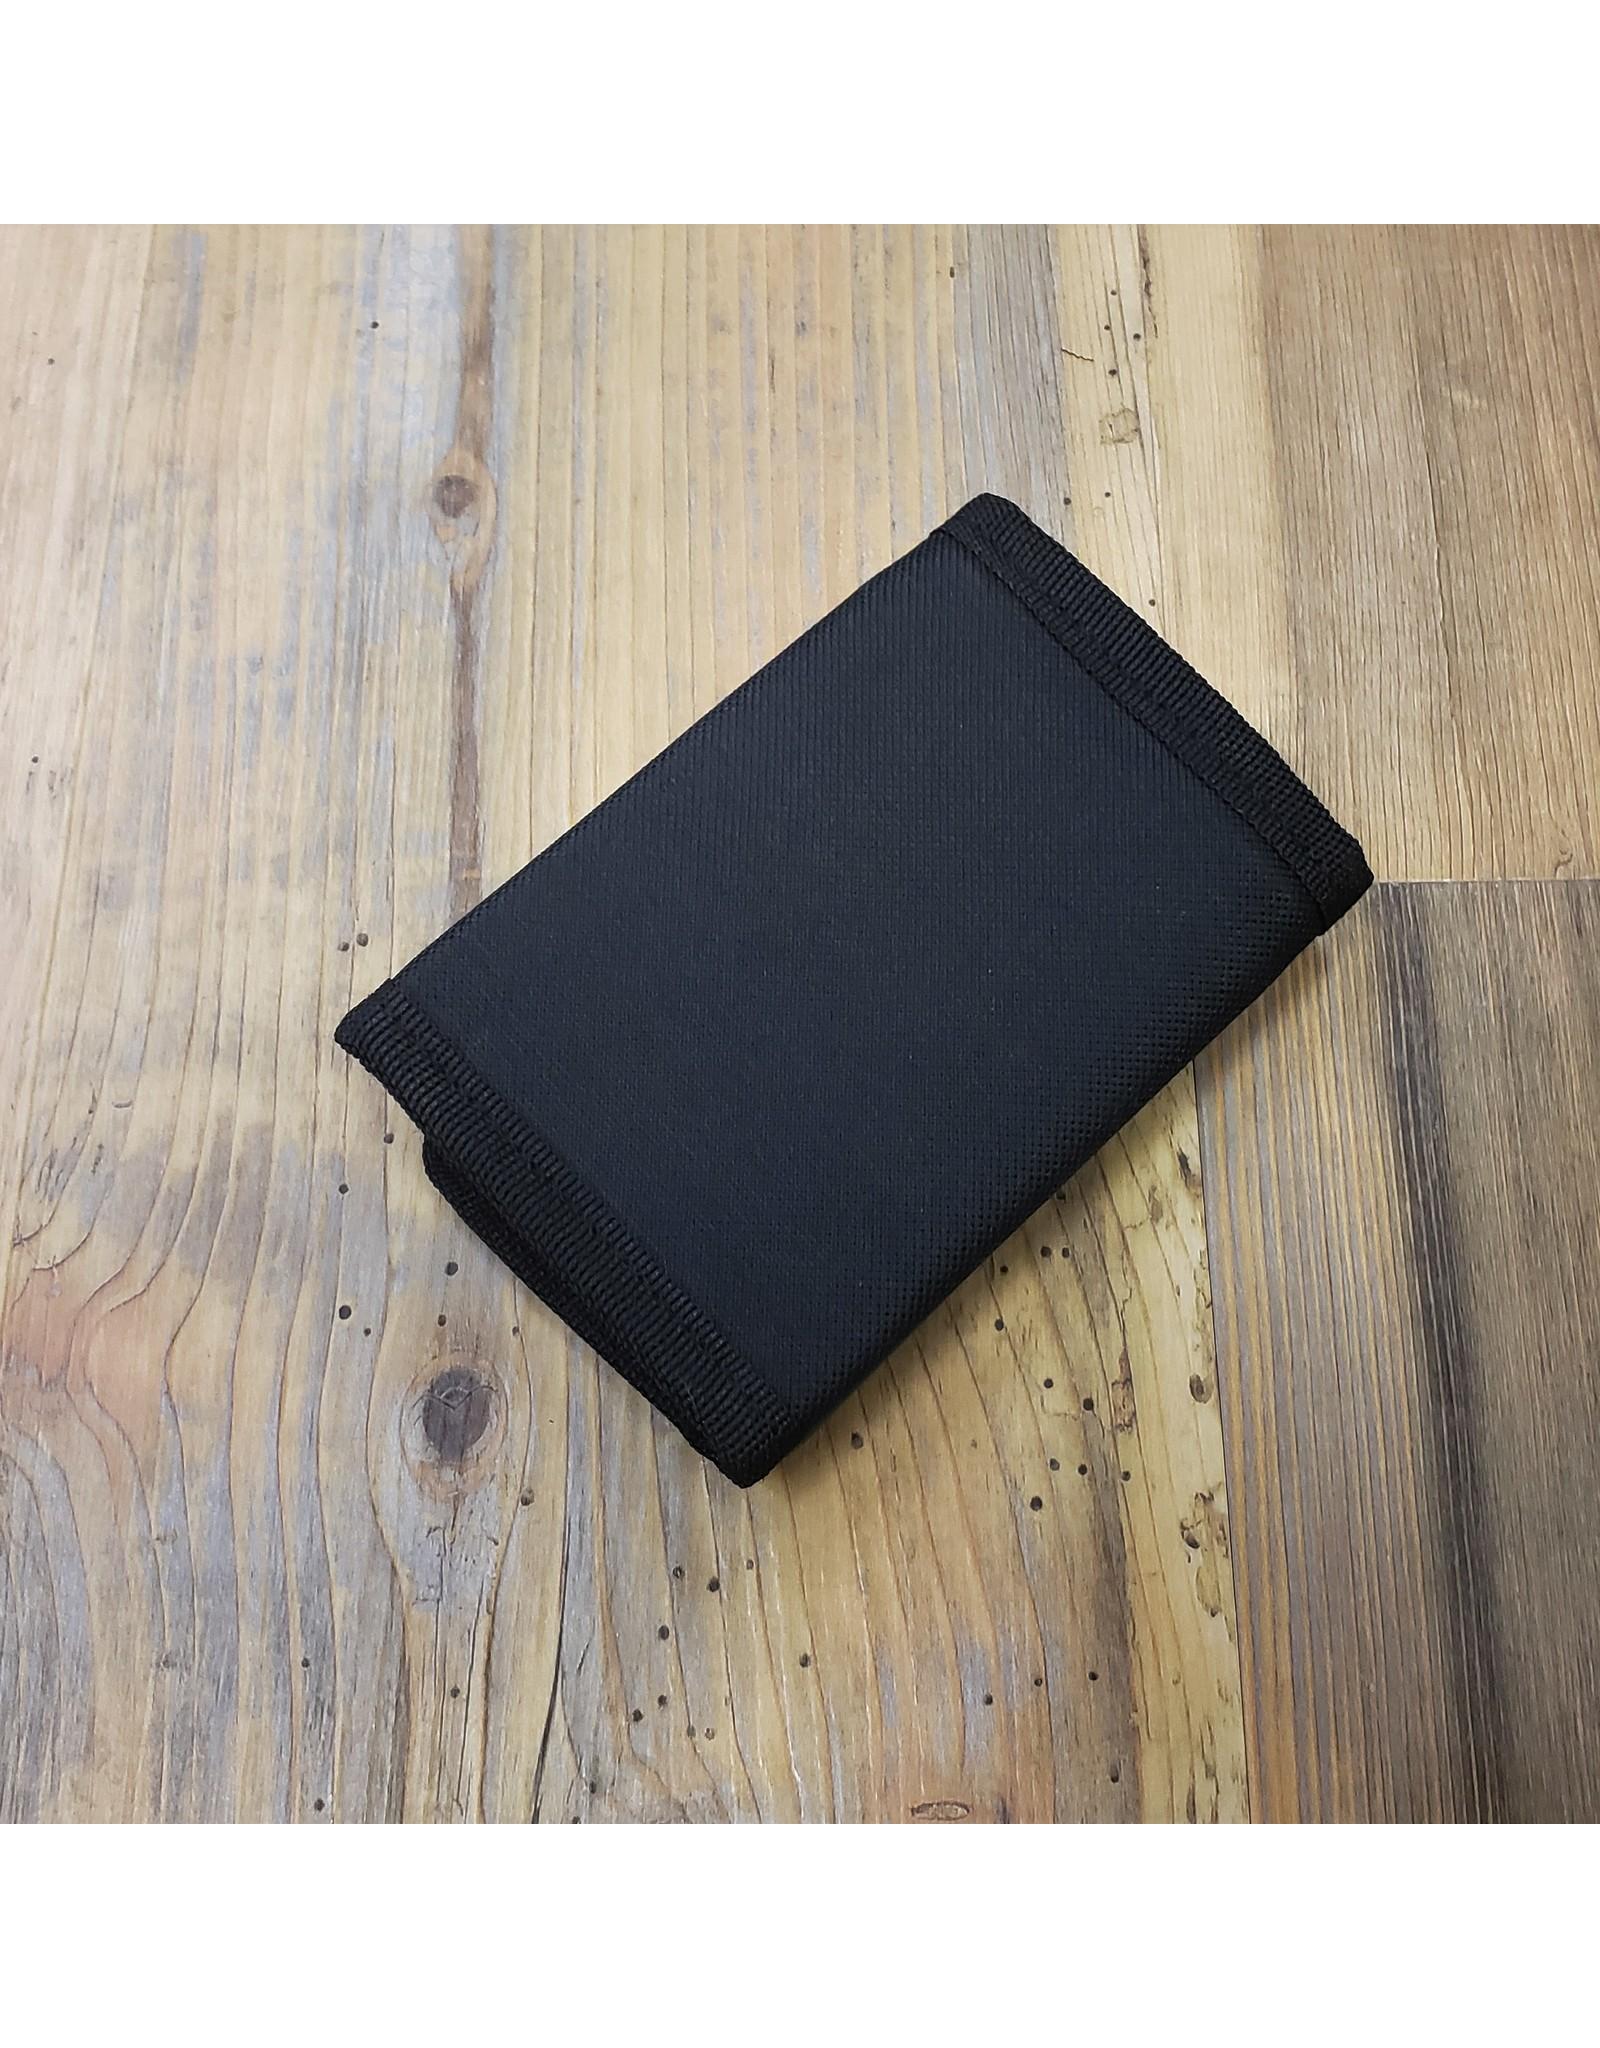 WORLD FAMOUS SALES ZIPPER TRI-FOLD WALLET, BLACK - 61-017